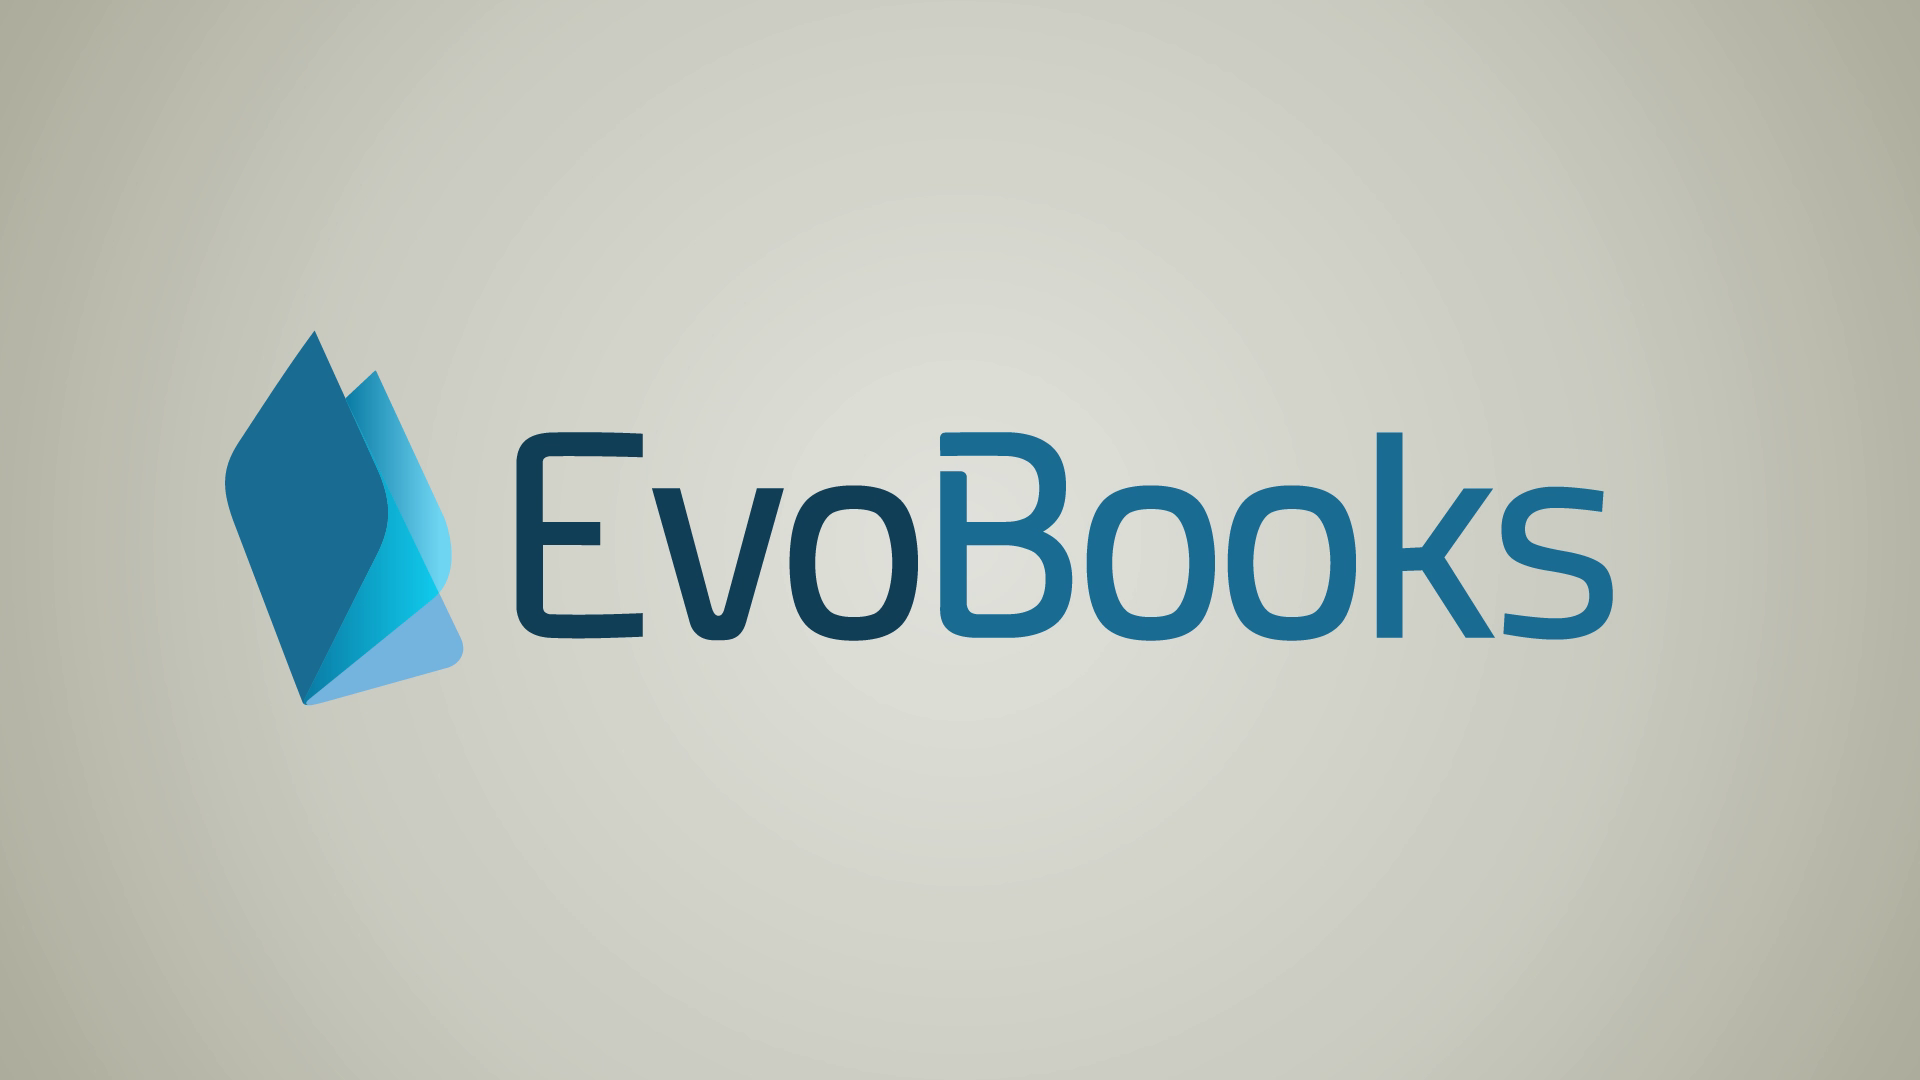 EvoBooks